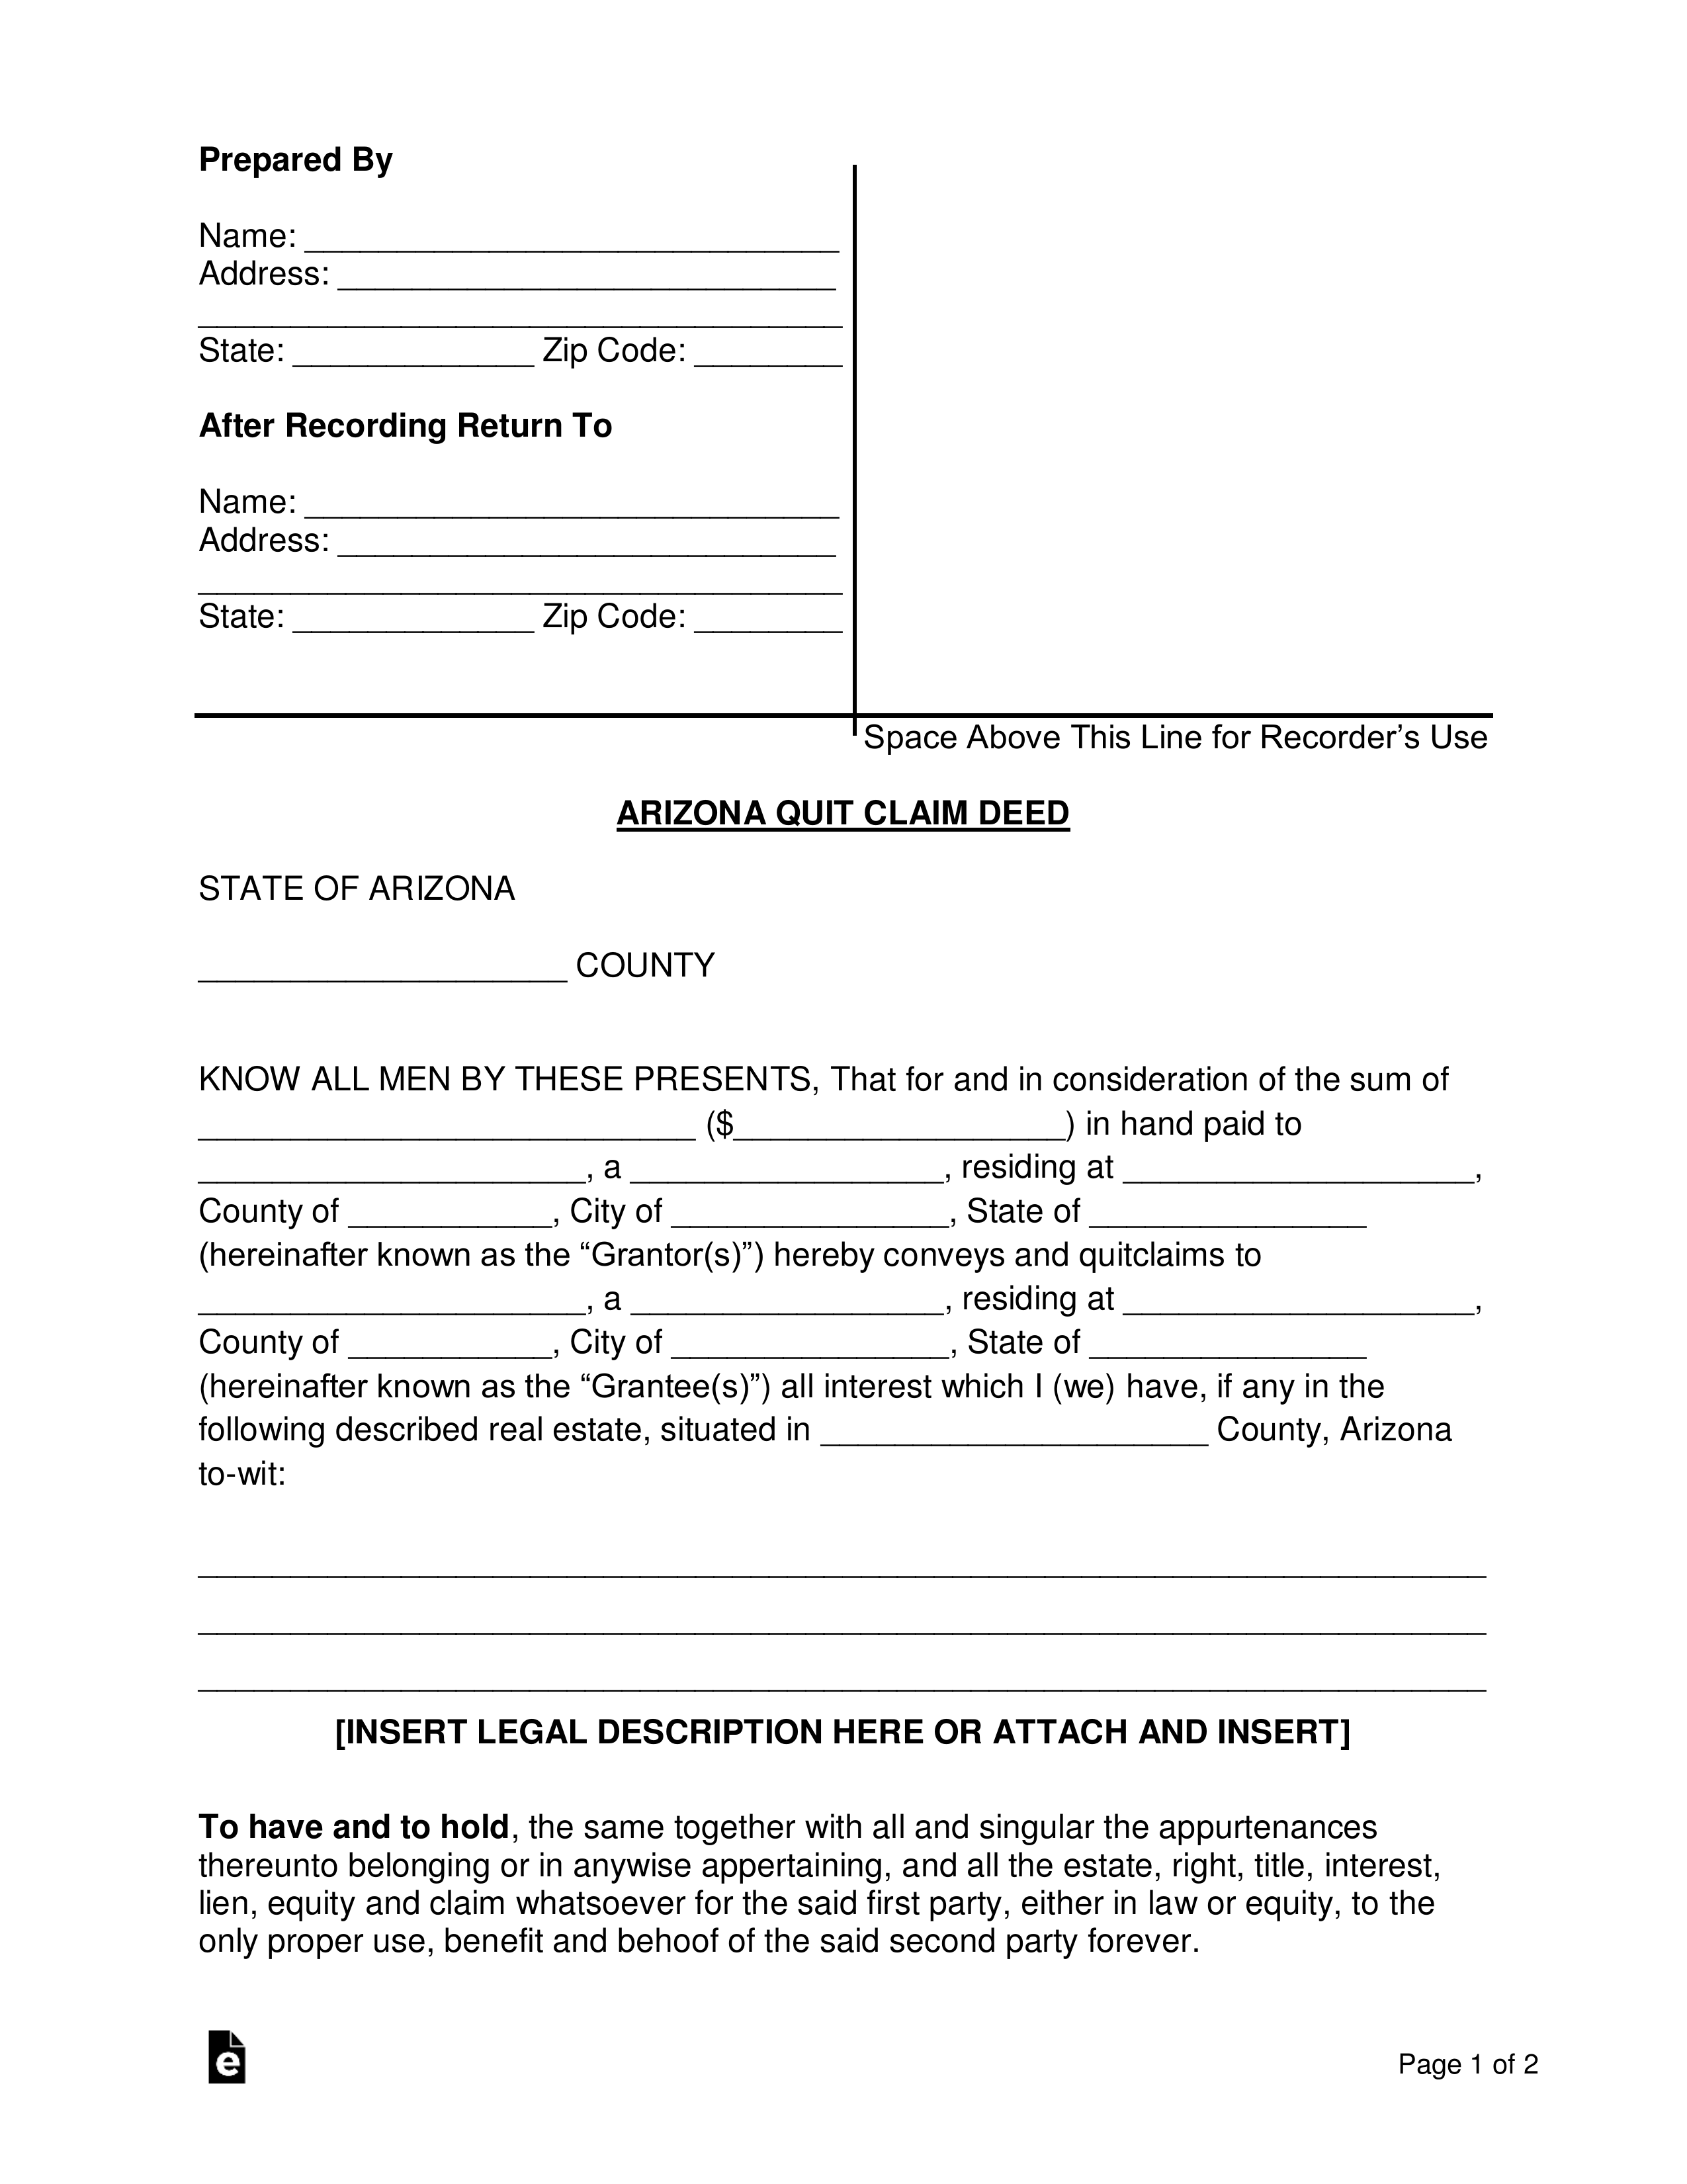 quick claim deed form arizona  Free Arizona Quit Claim Deed Form - Word | PDF | eForms ...